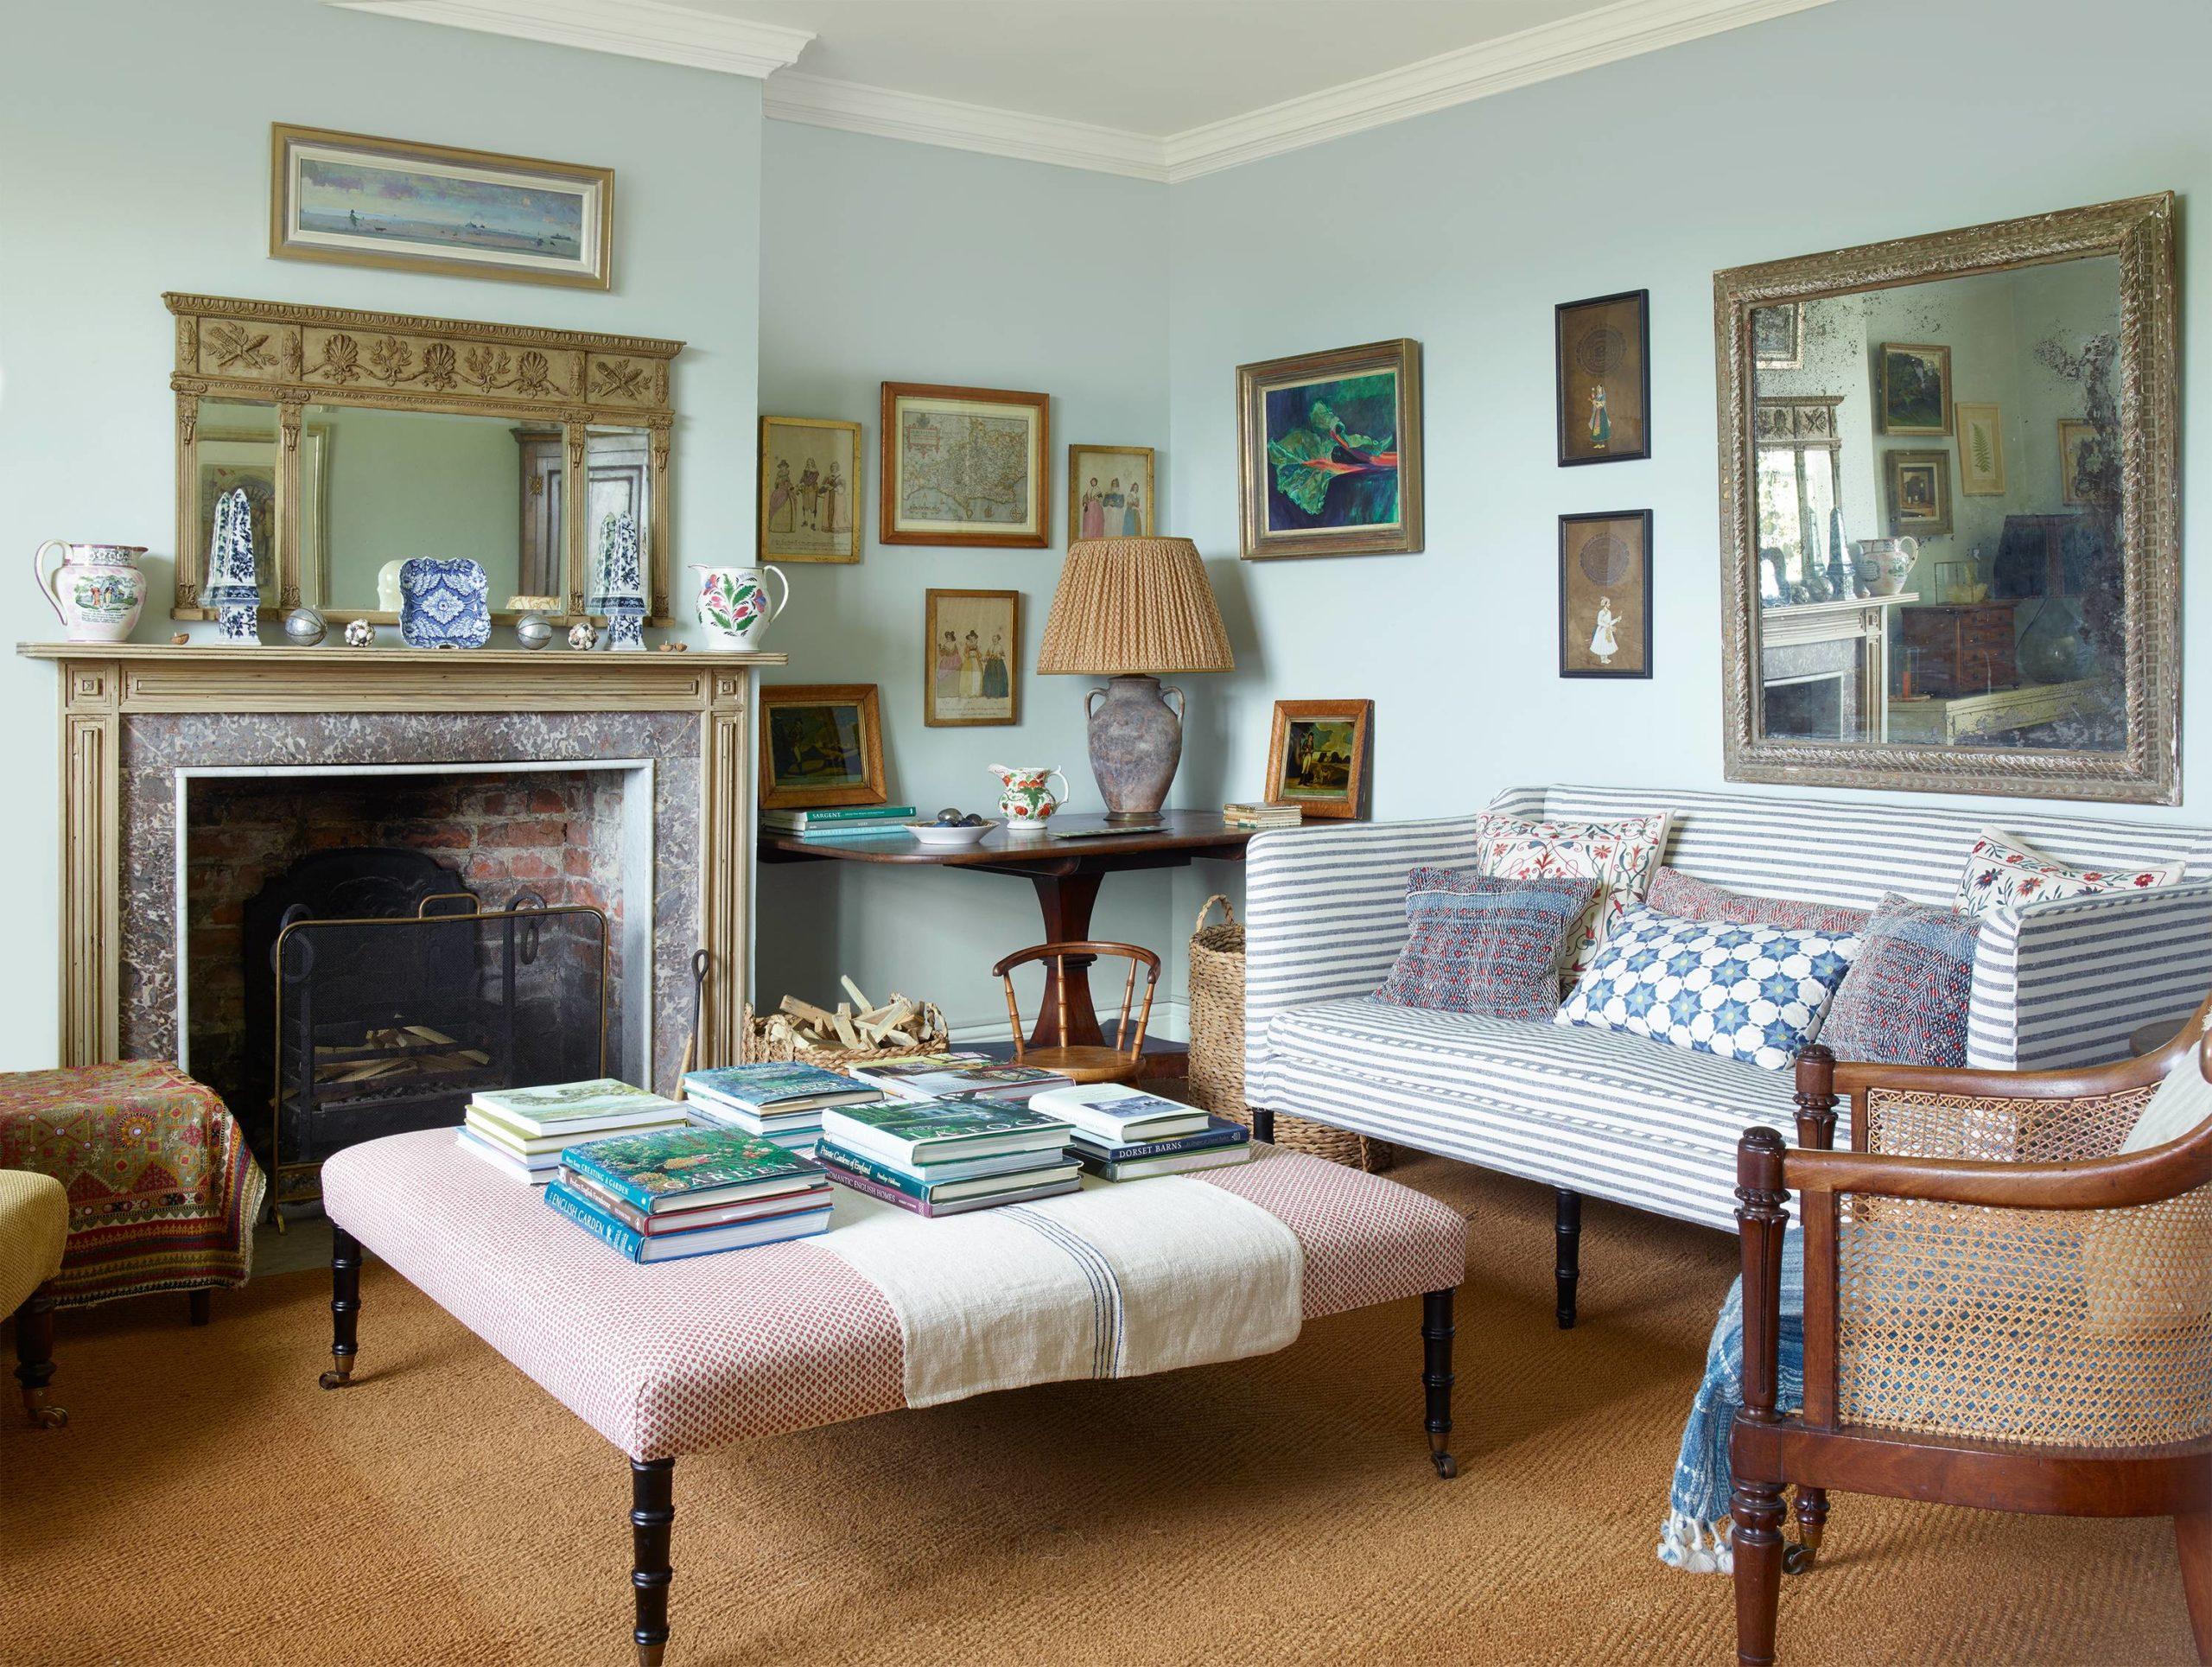 10 Cozy Country Living Room Decor Ideas - Talkdecor